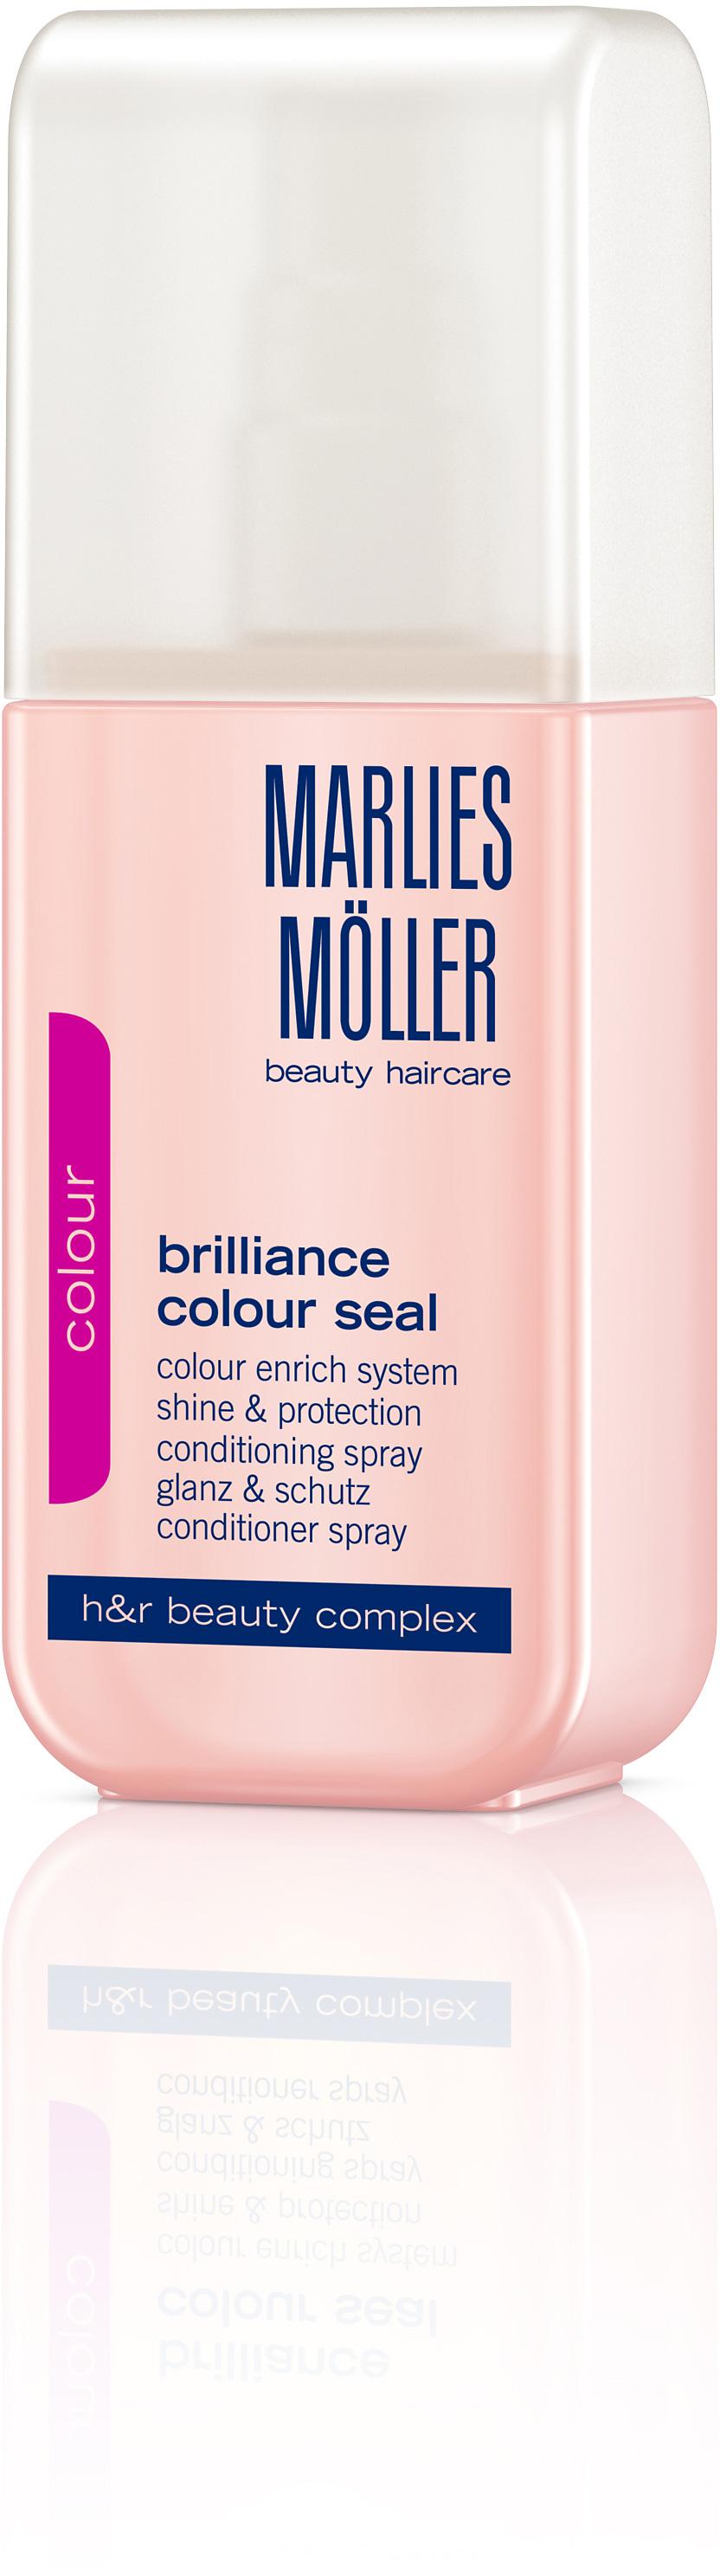 Marlies Möller Clean Brilliance Colour 125 ml